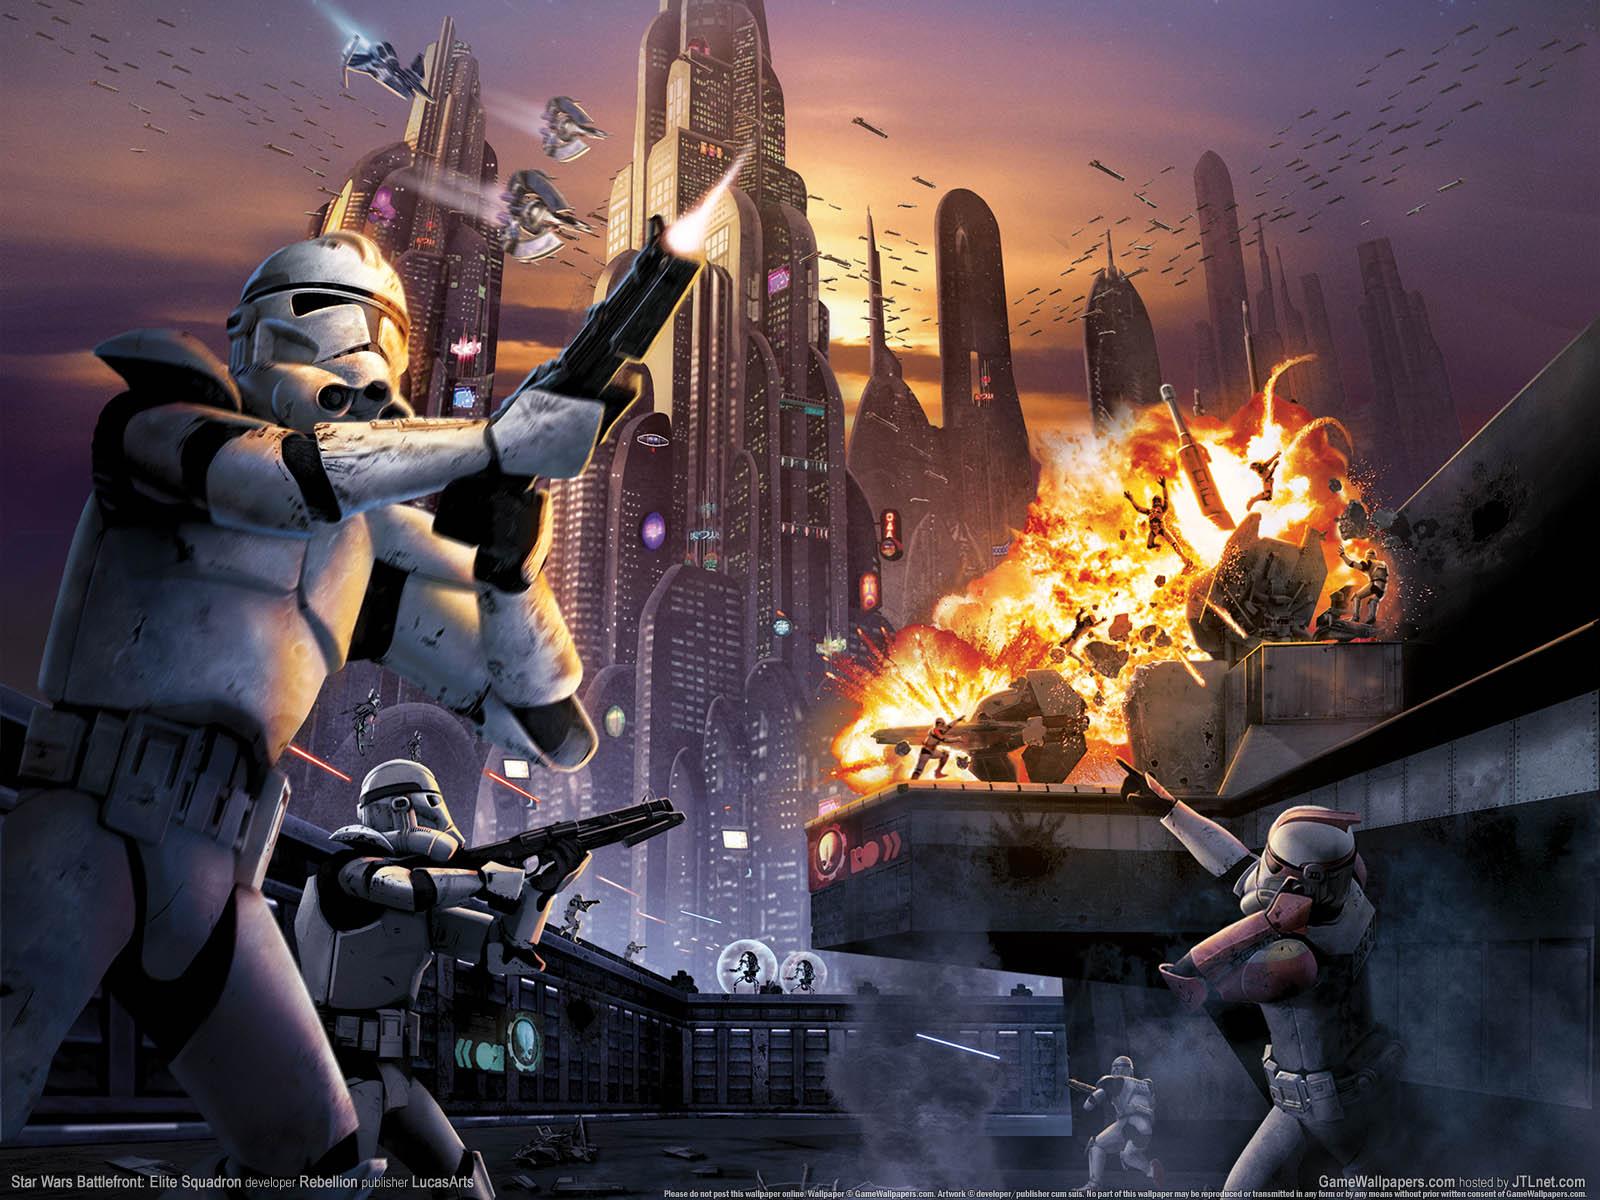 Fantástico esse wallpaper do star wars